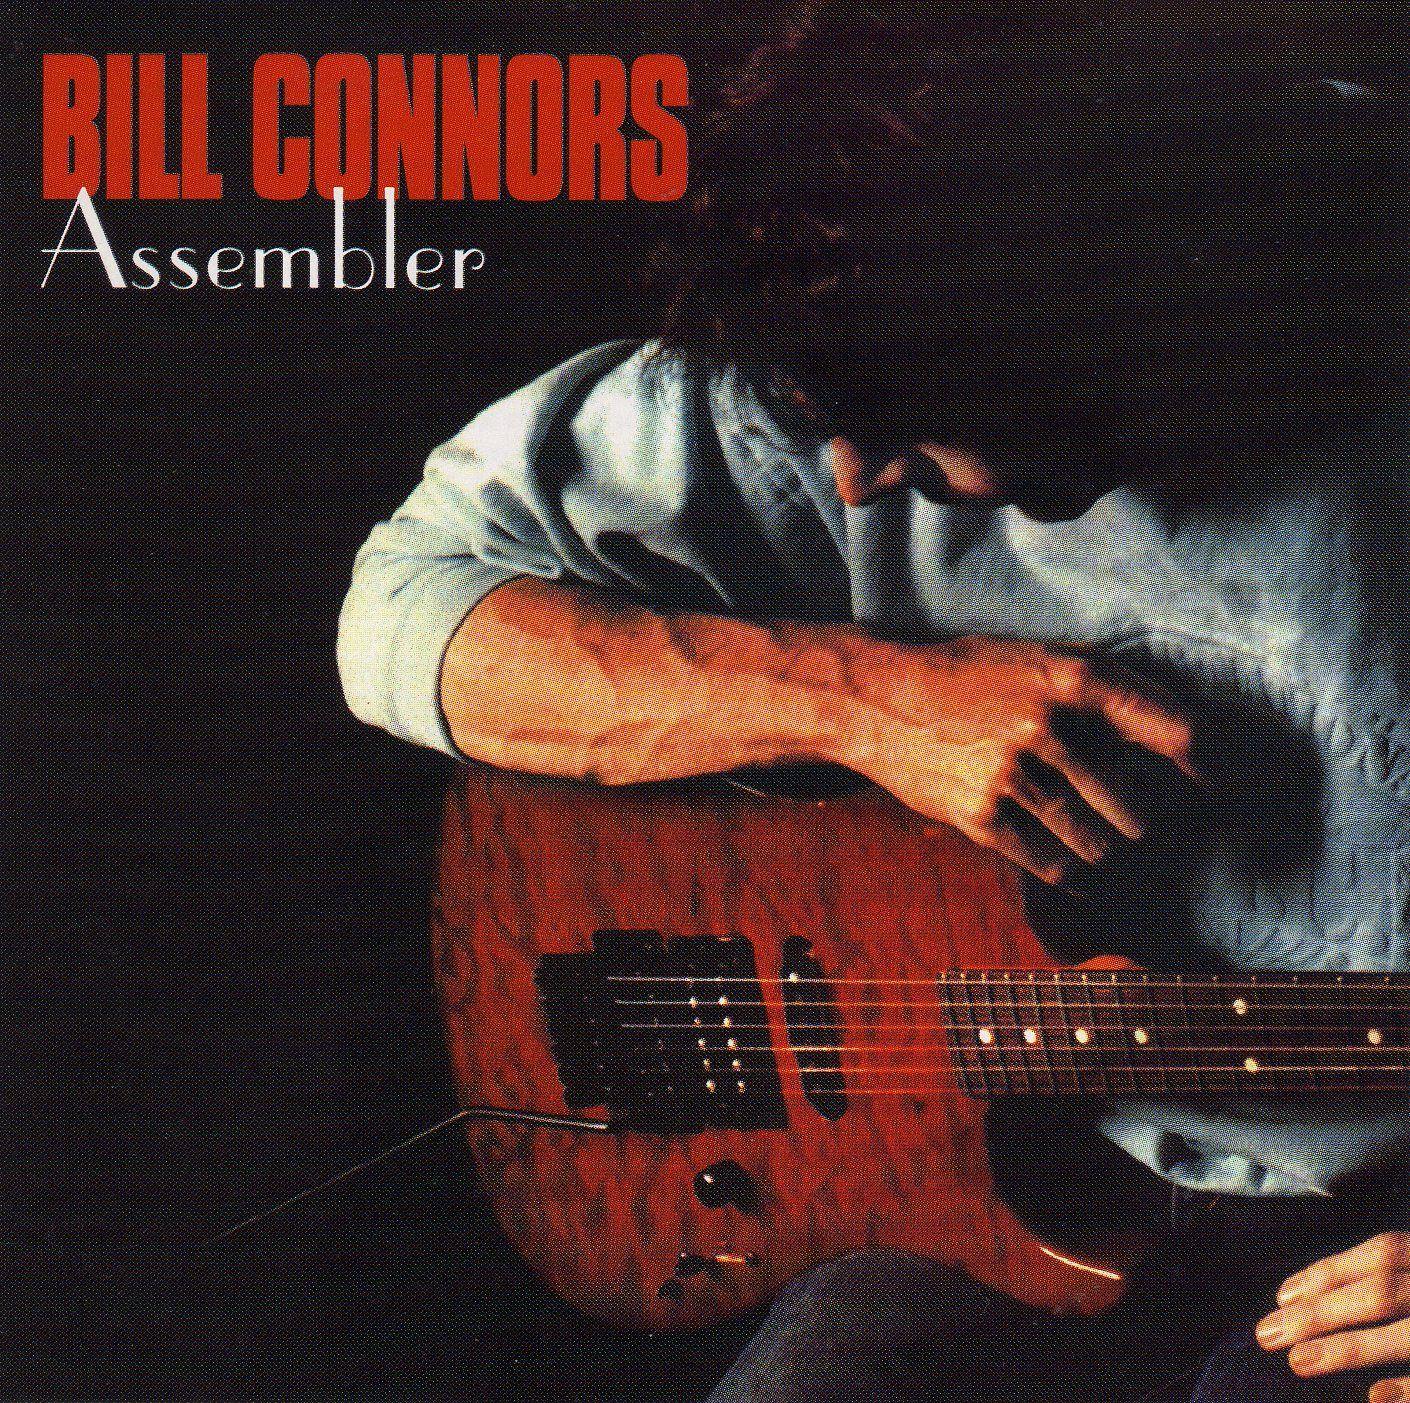 jazz rock fusion guitar bill connors 1987 1994 assembler. Black Bedroom Furniture Sets. Home Design Ideas